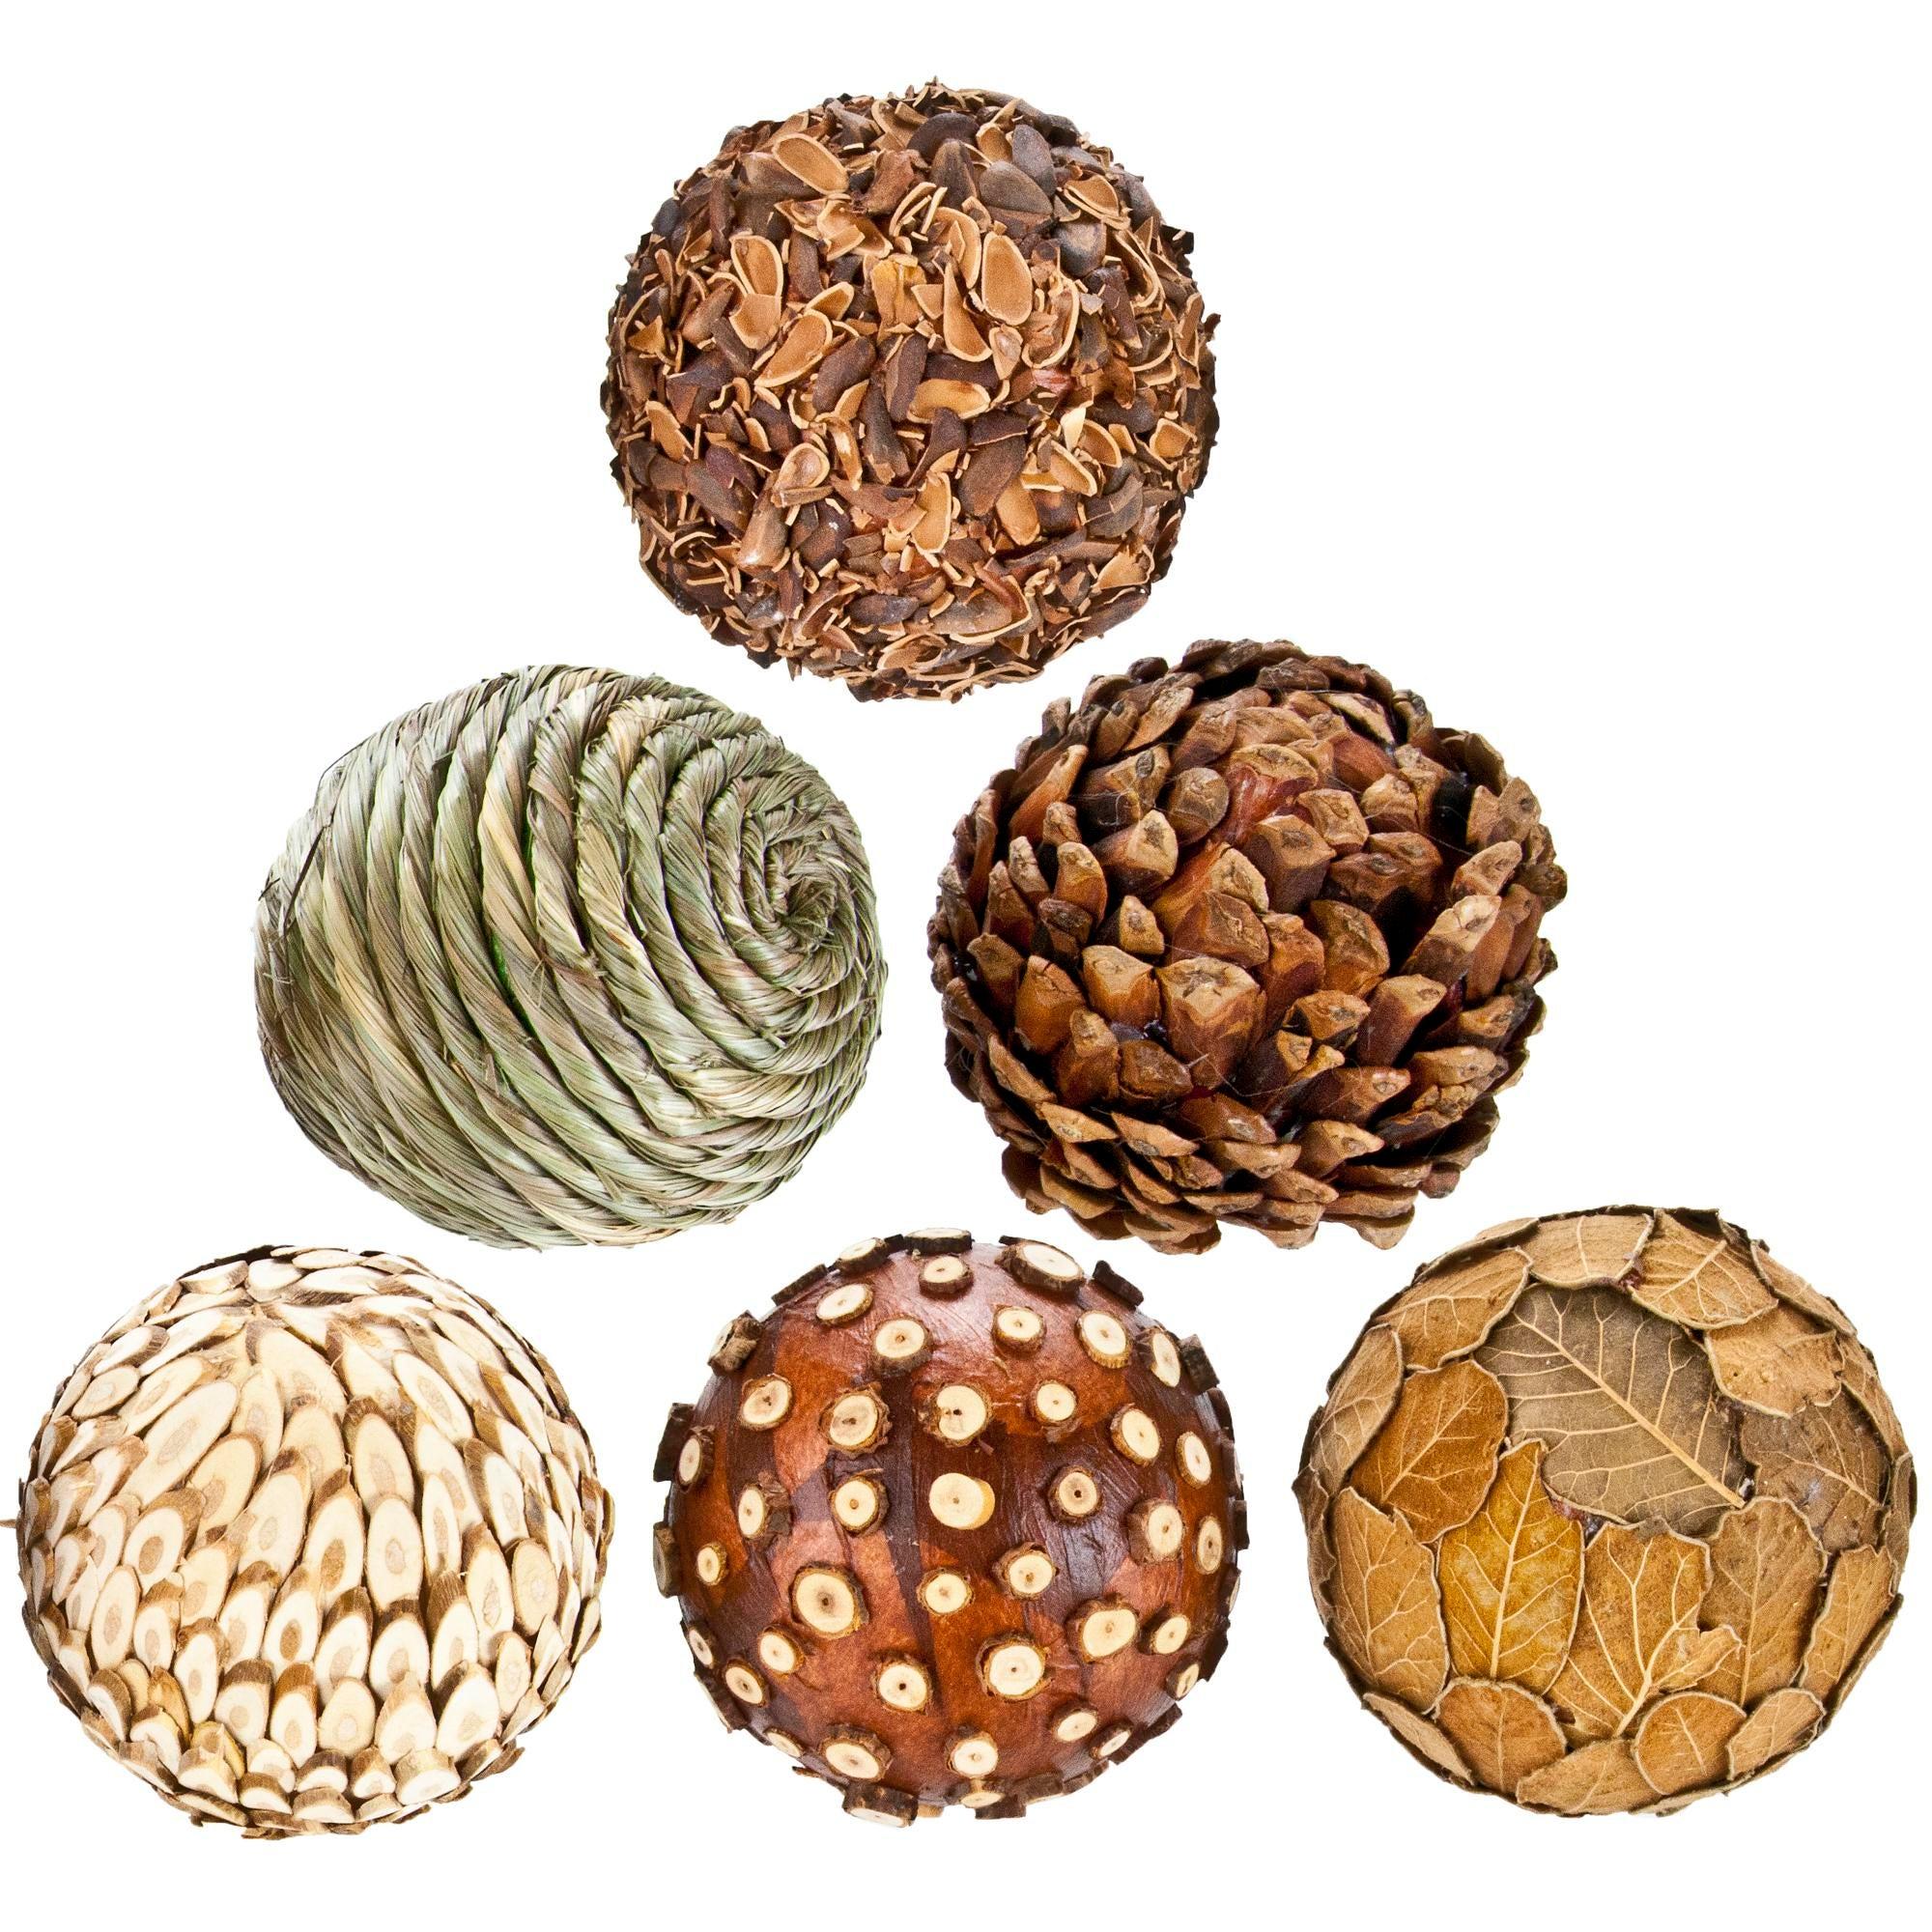 Natural Decorative Balls Classy Natural Decorative Balls  Set Of 6  Chairish Design Ideas